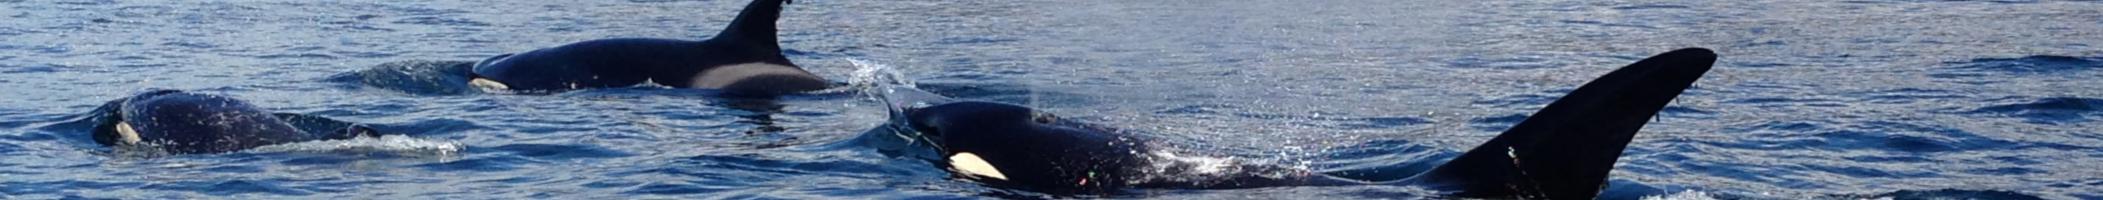 killerwhales_banner